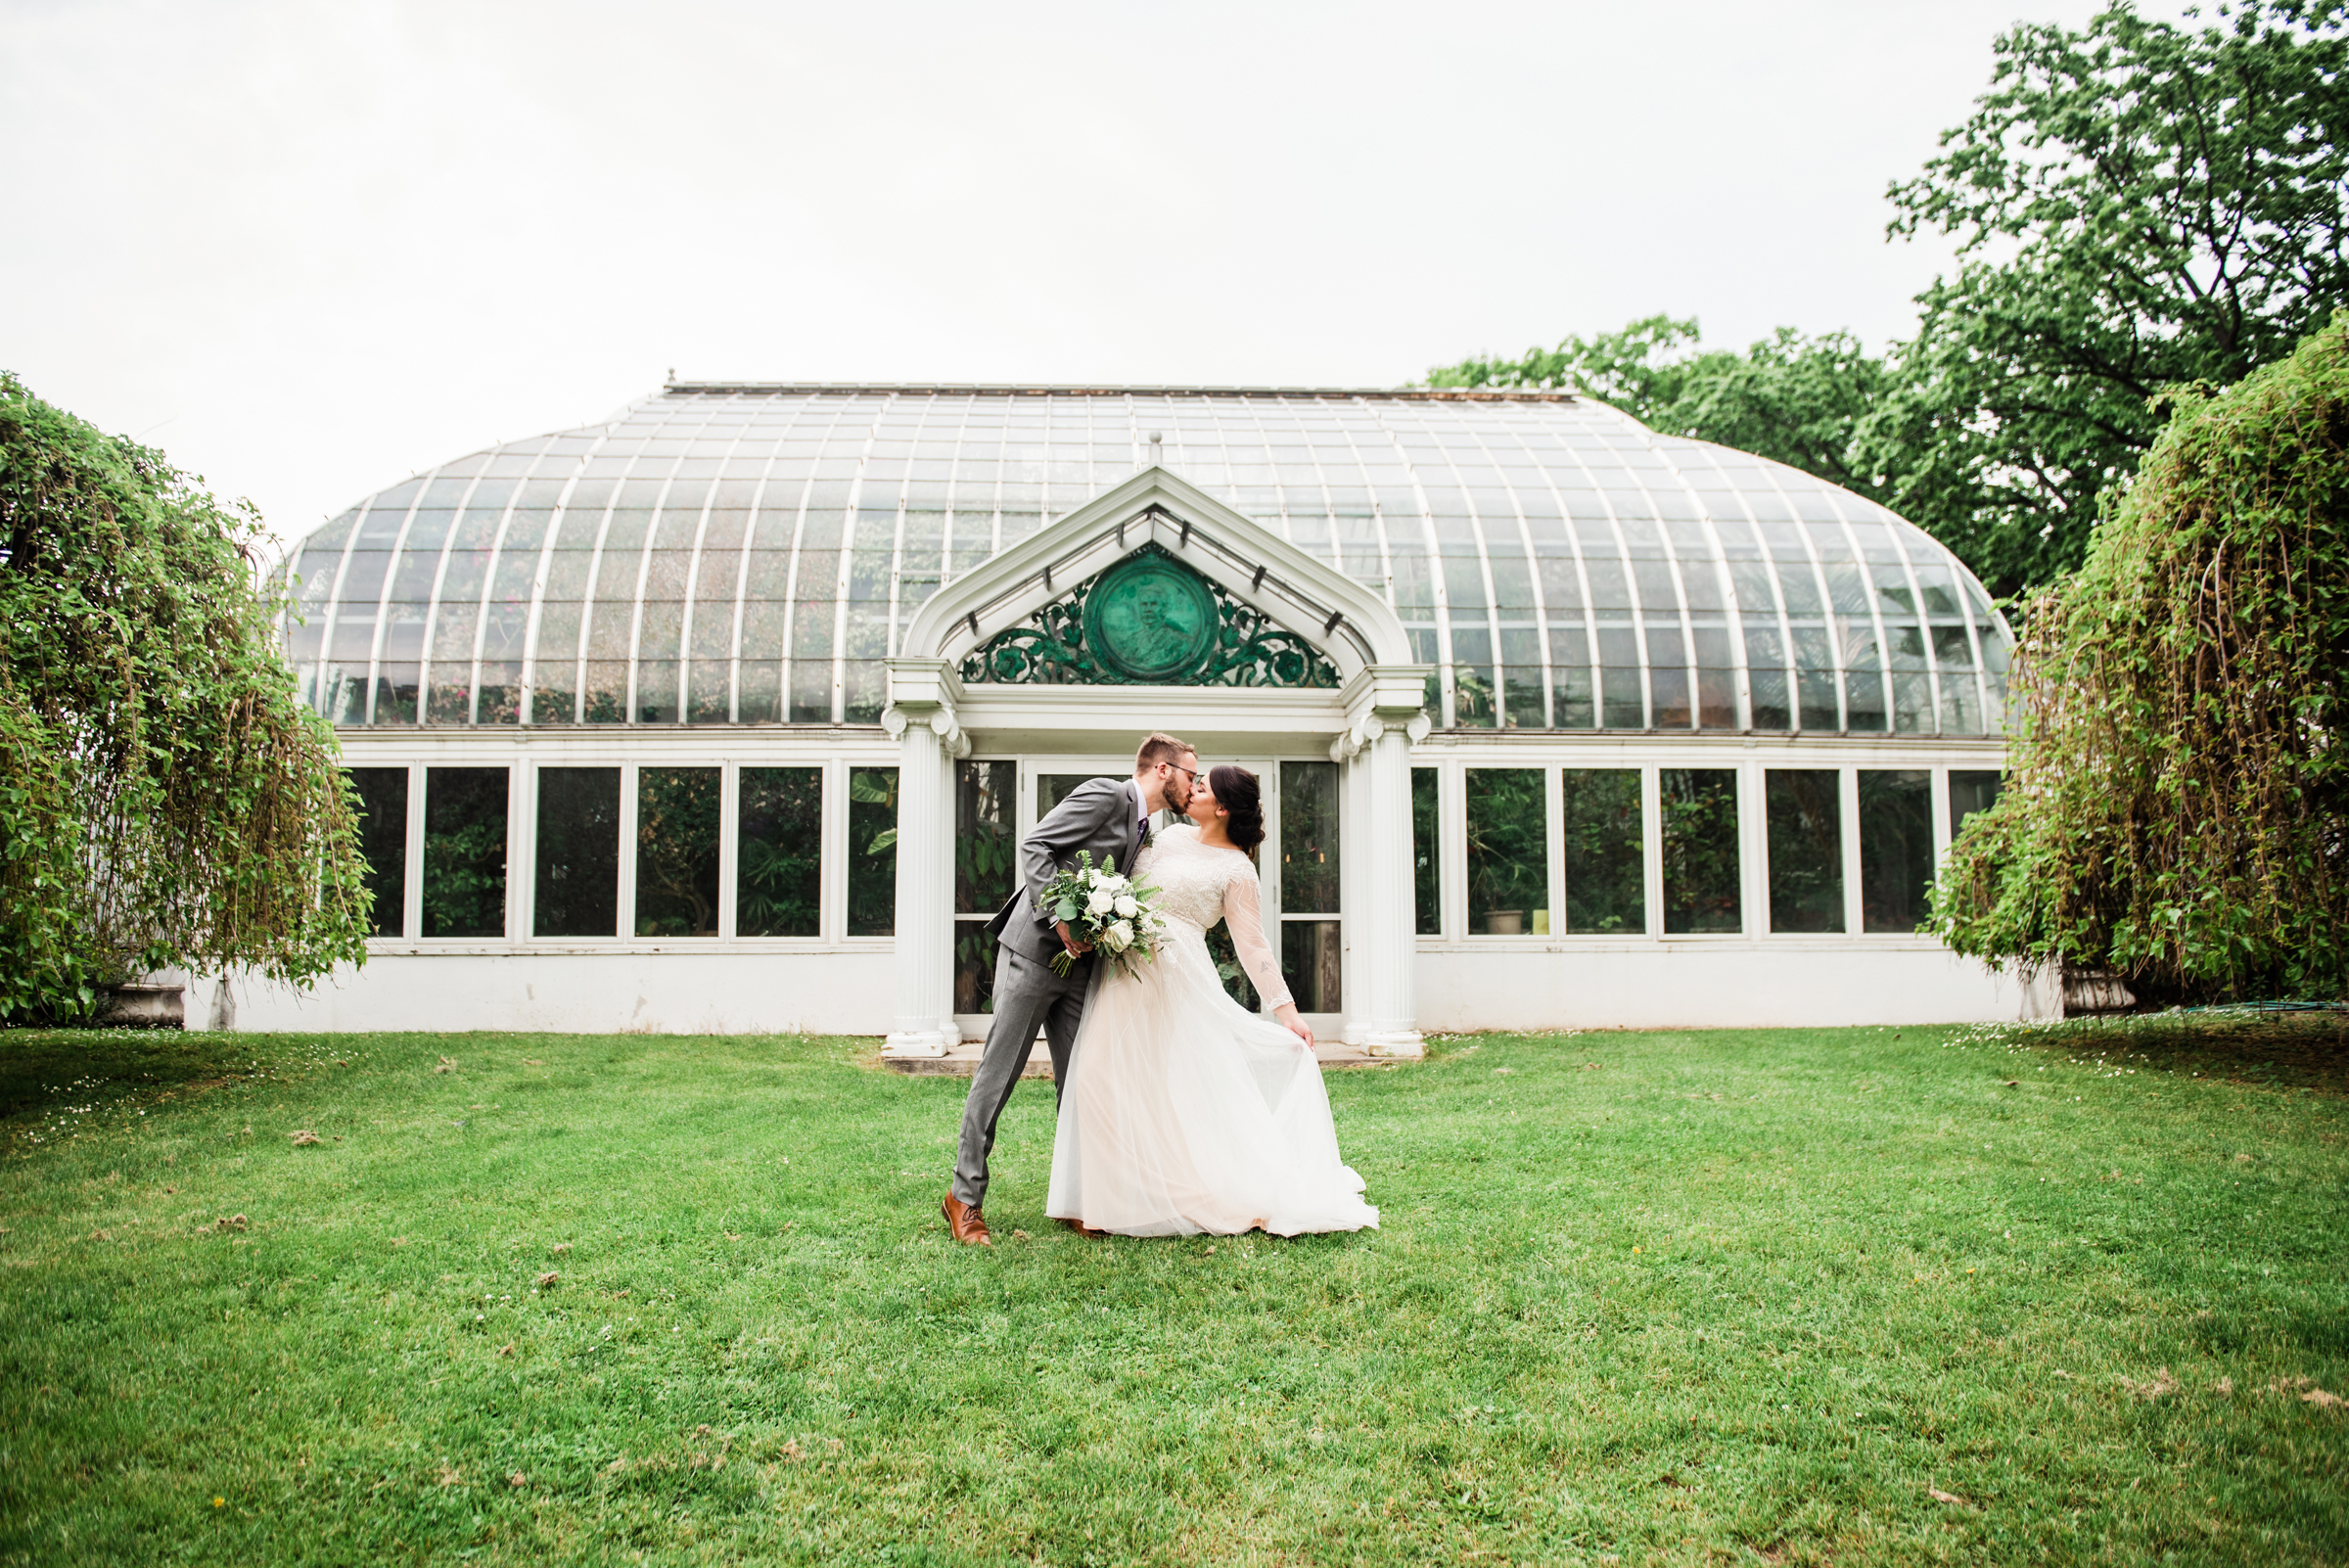 Studio_180_Lamberton_Conservatory_Rochester_Wedding_JILL_STUDIO_Rochester_NY_Photographer_DSC_8803.jpg